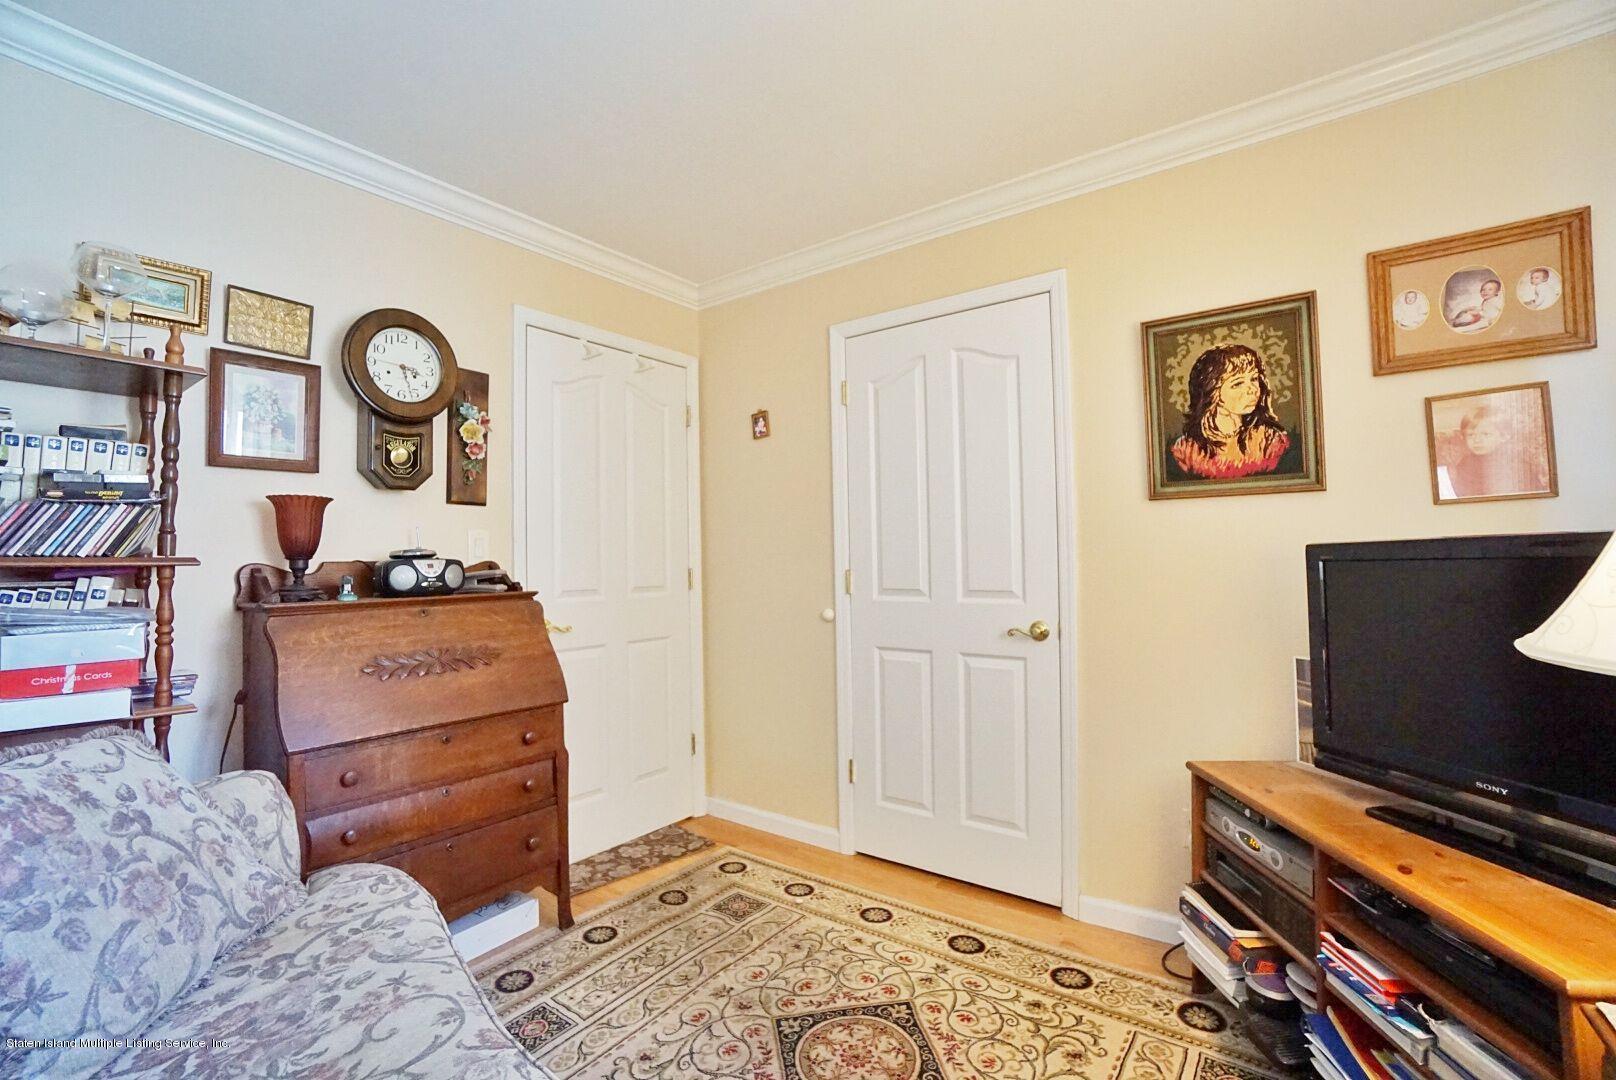 Single Family - Detached 283 Holdridge Avenue  Staten Island, NY 10312, MLS-1130000-20